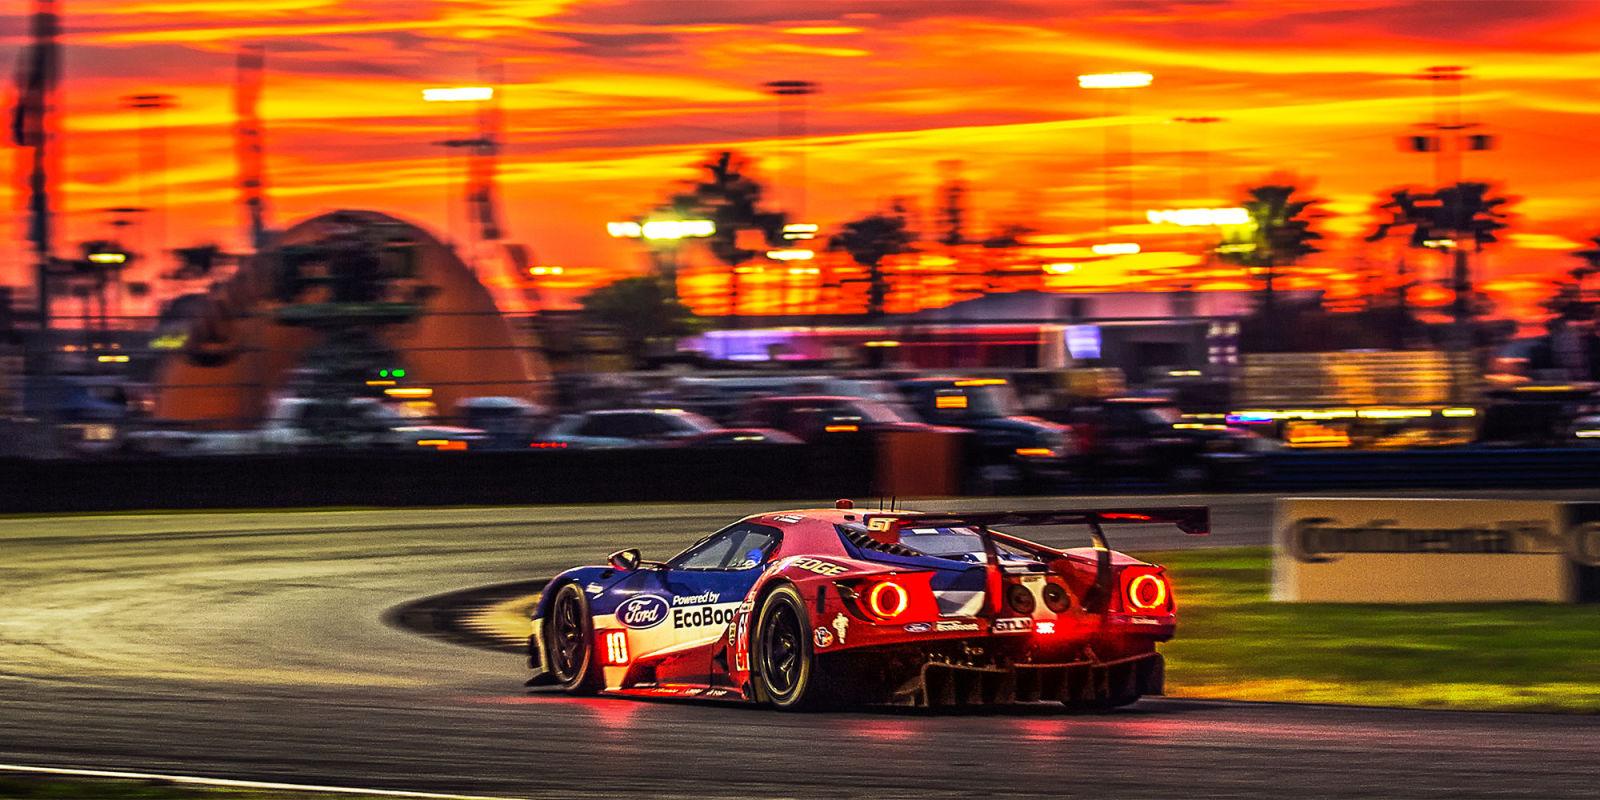 1465334431 fordgtlemansledephoto Η... ακτινογραφία του φετινού Le Mans